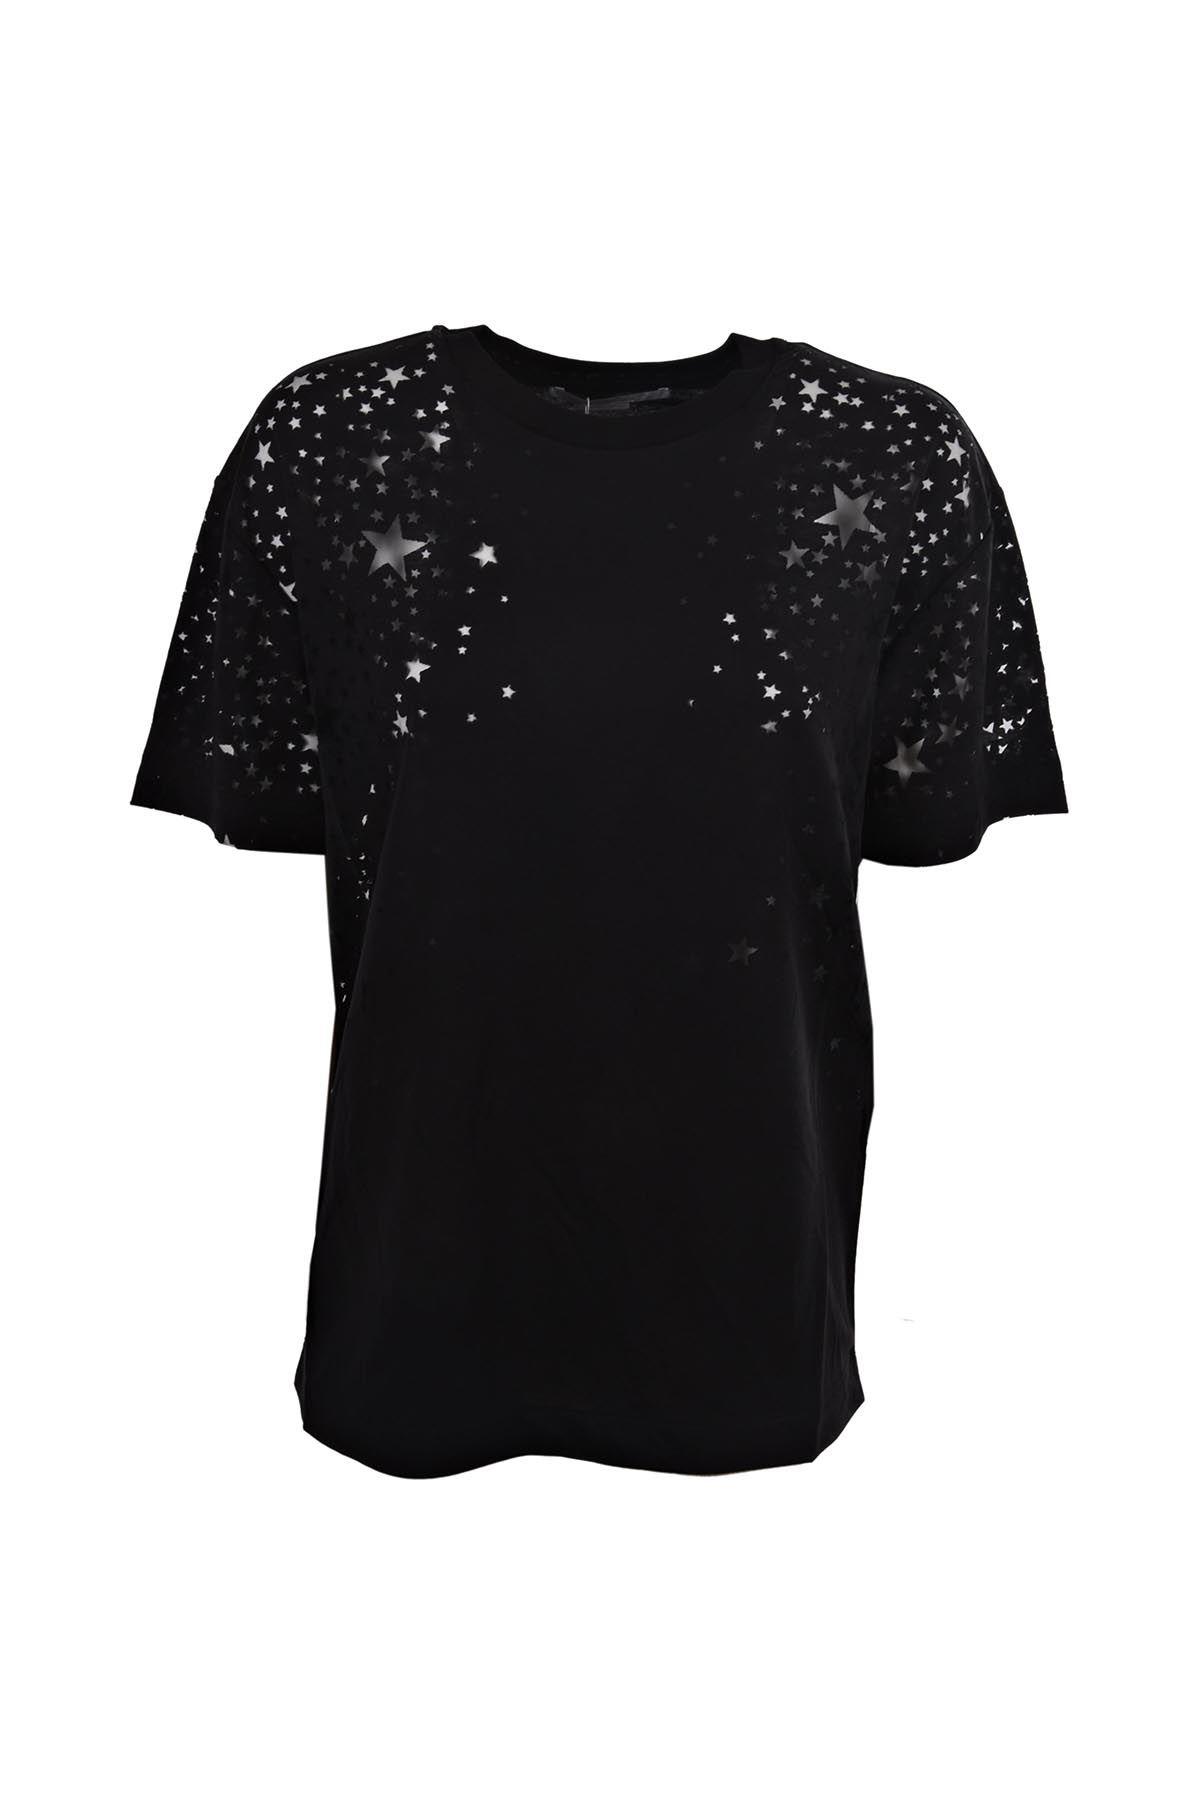 Stella McCartney Mccartney Star T-shirt